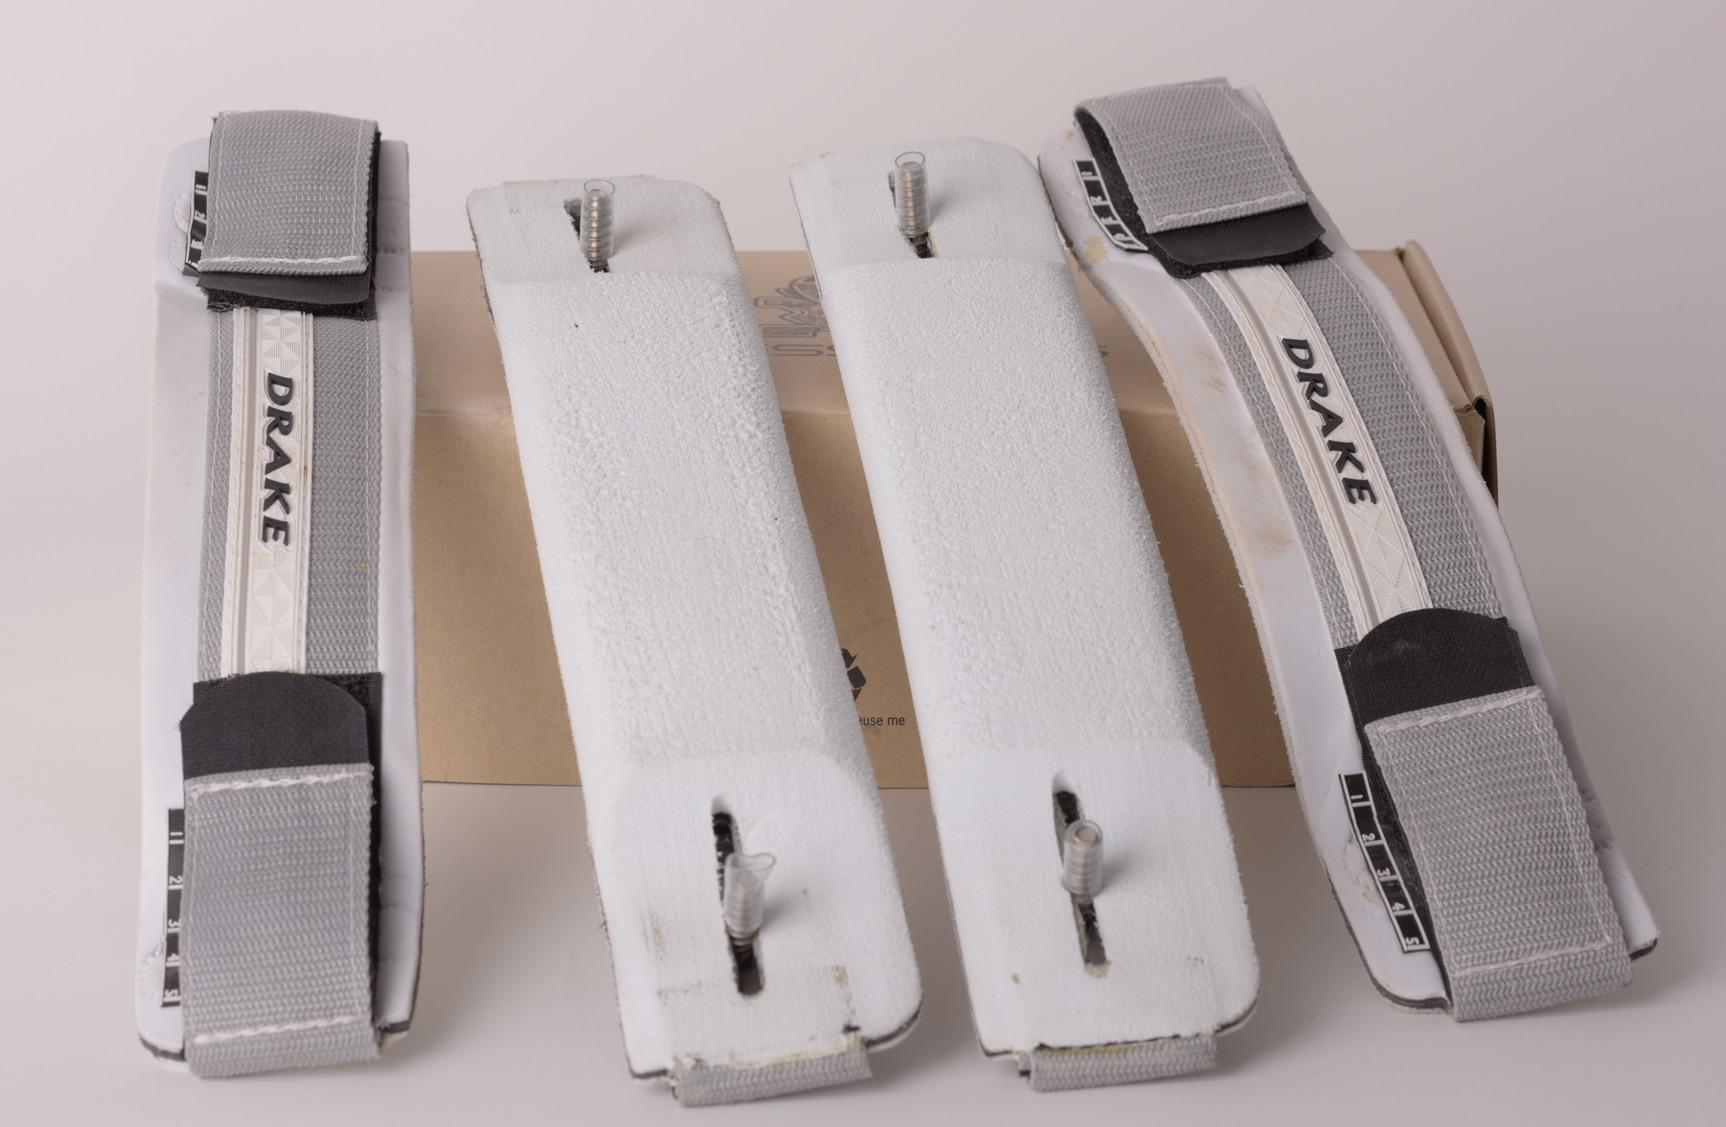 Starboard Drake straps